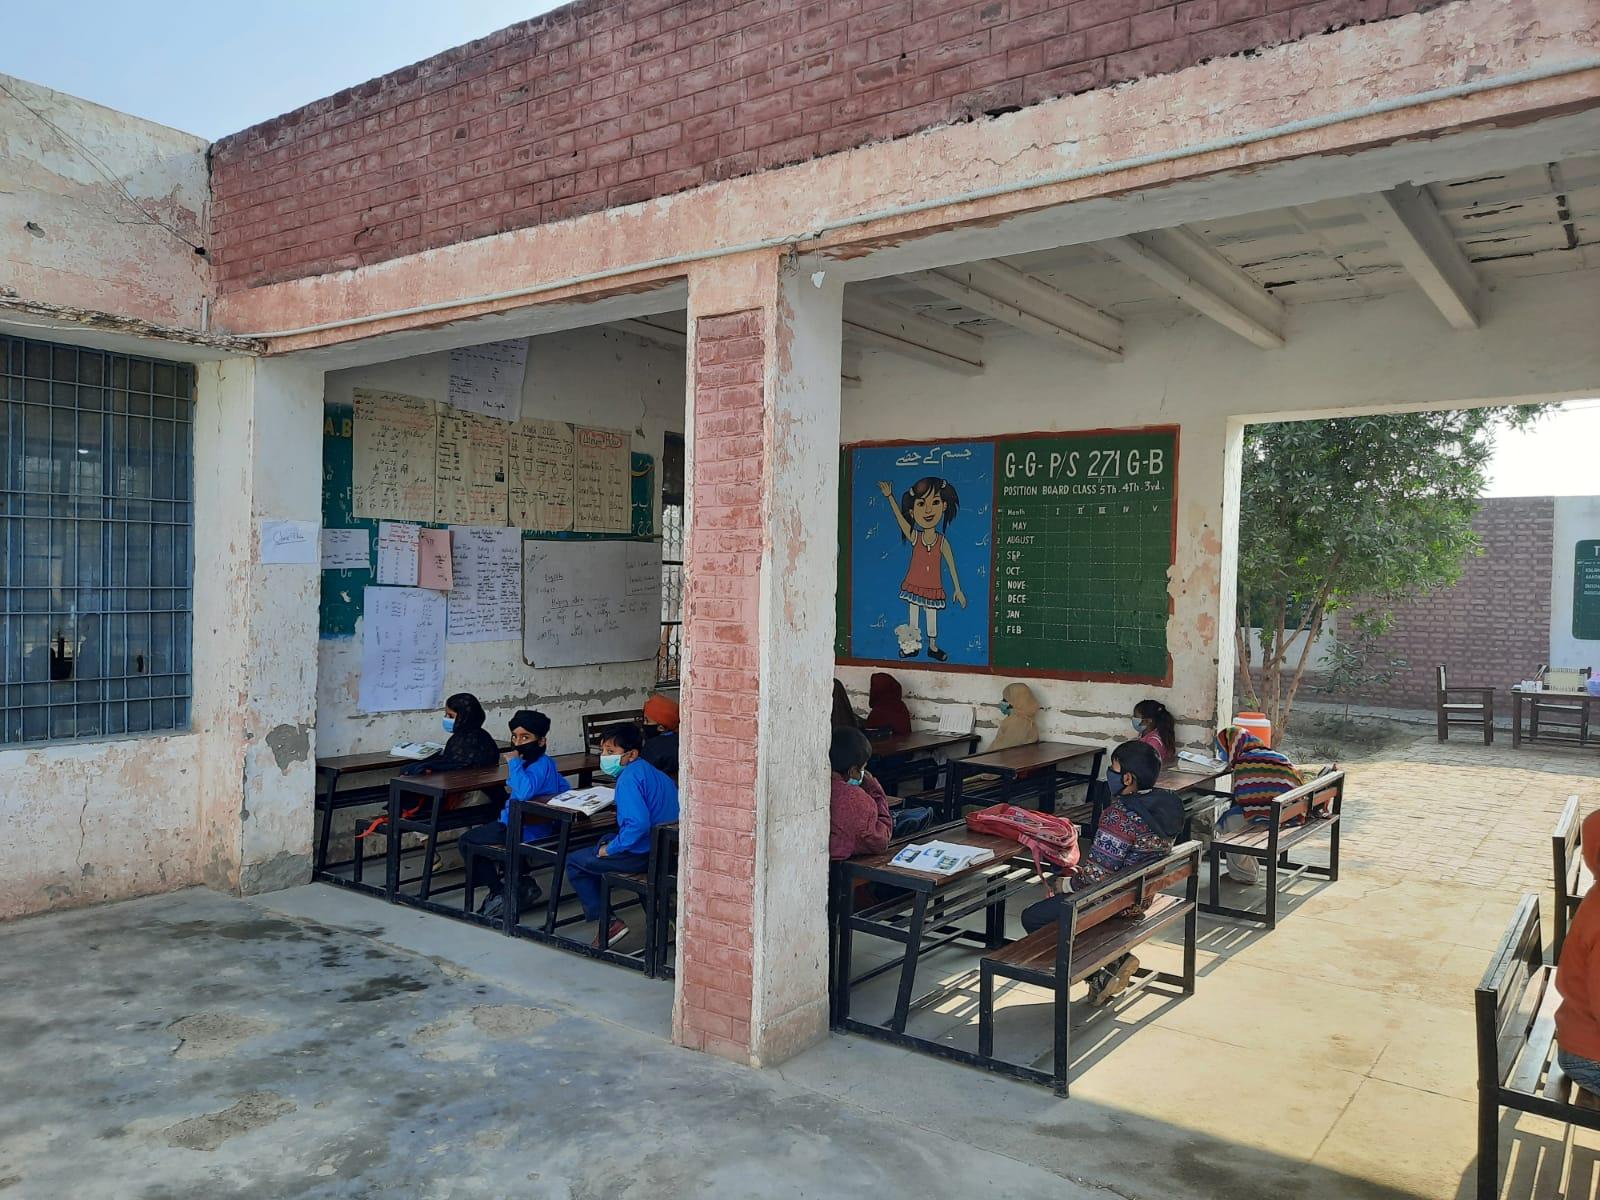 2021 Govt. Primary School 271GB, Toba Tek Singh, Pakistan